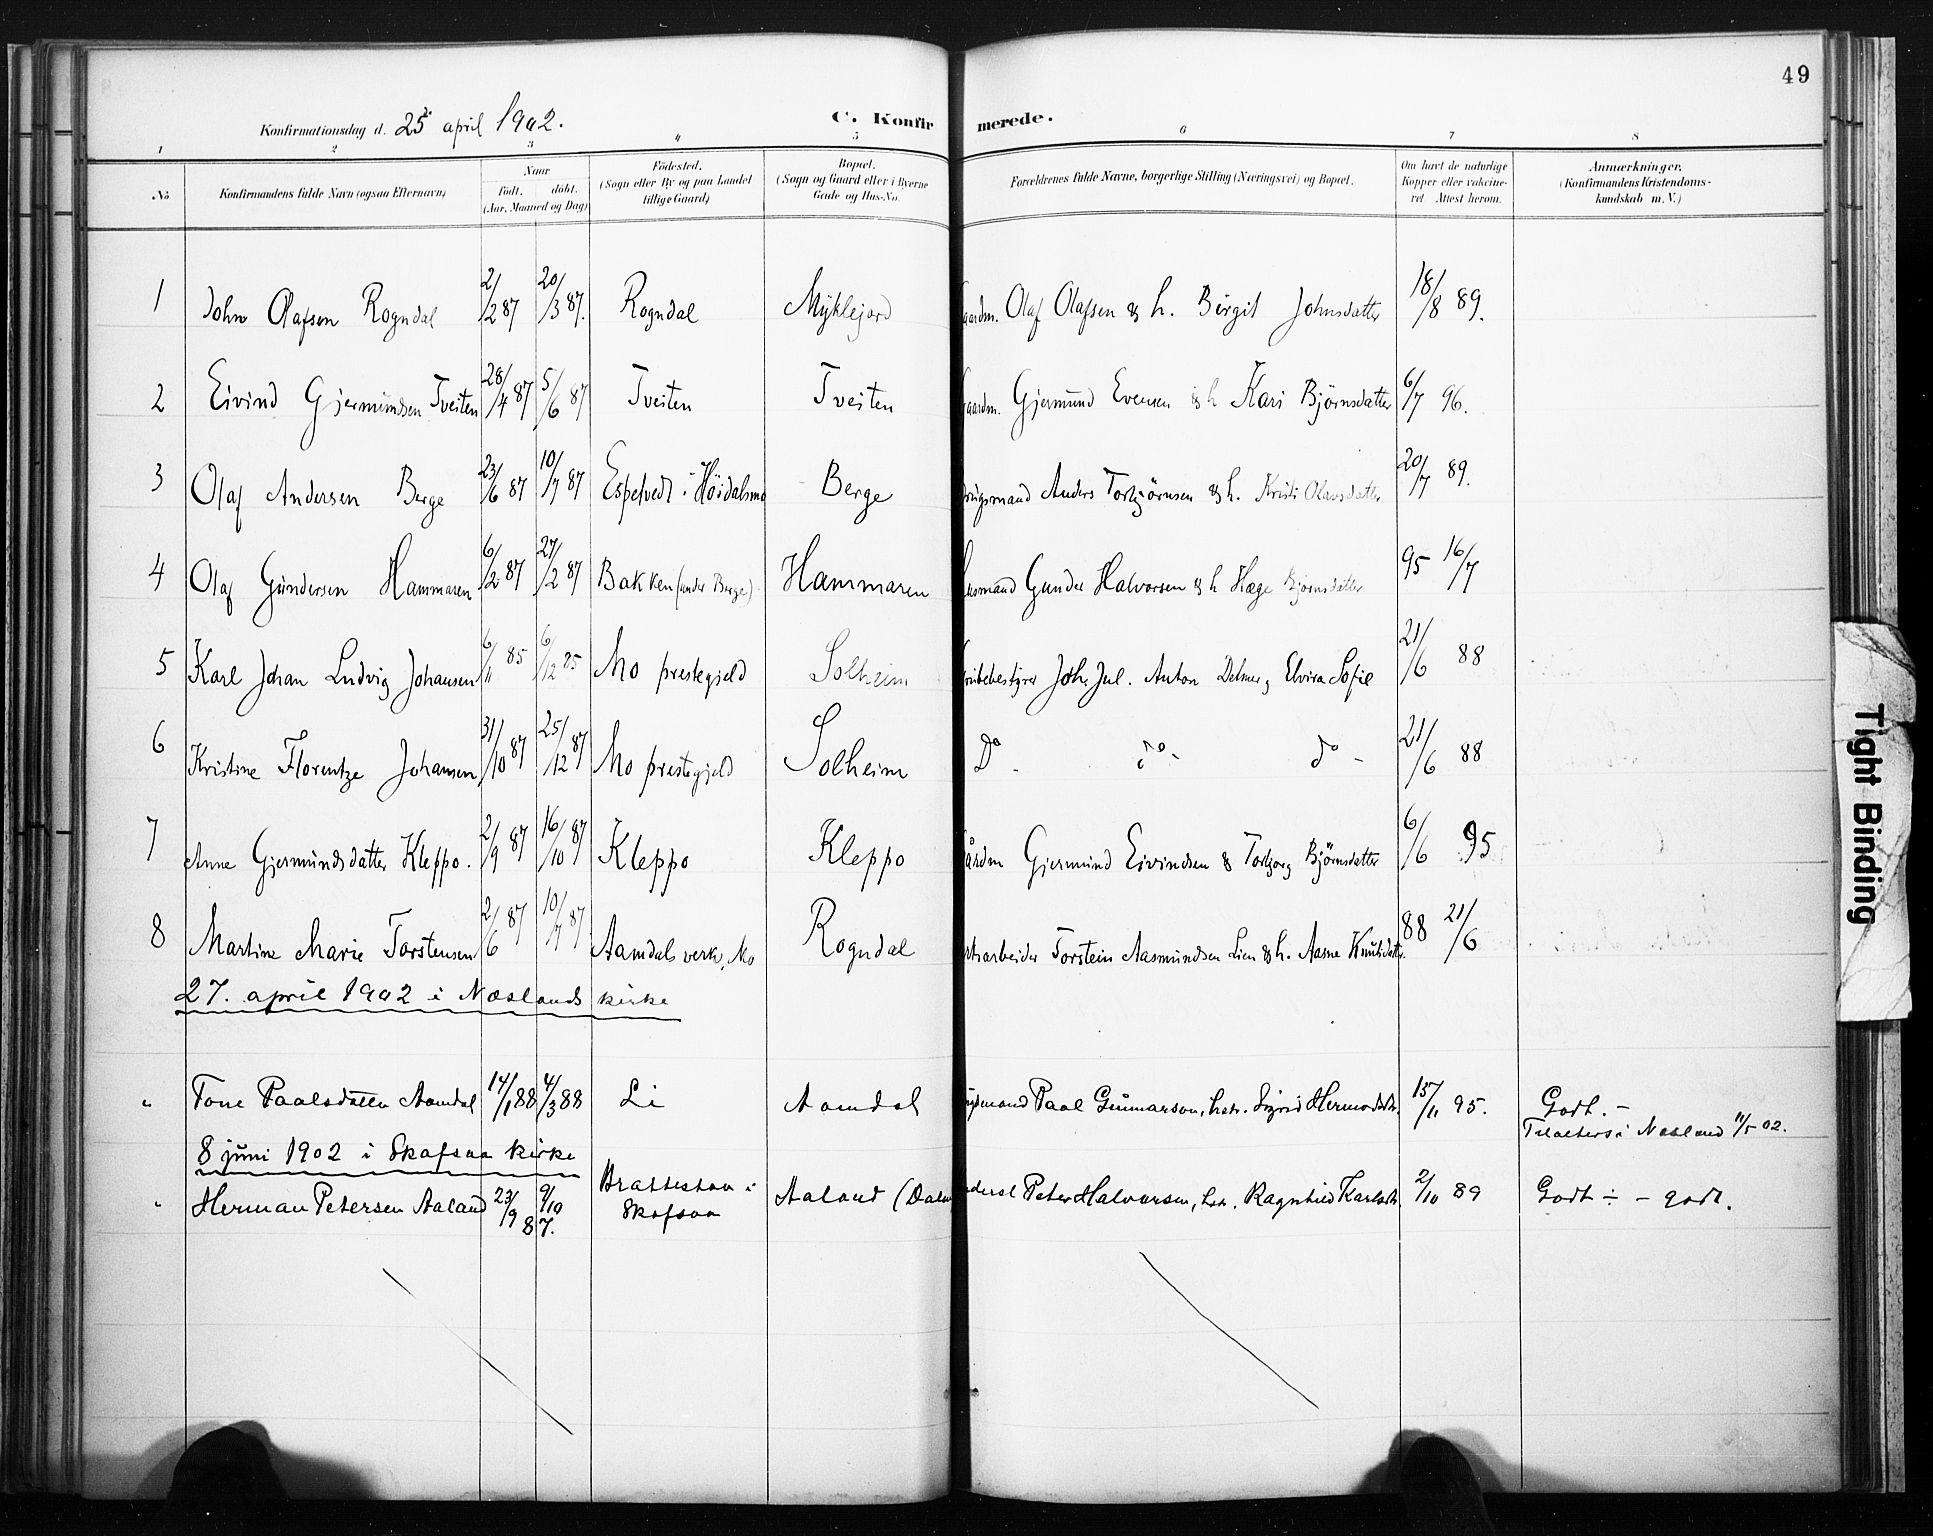 SAKO, Lårdal kirkebøker, F/Fb/L0002: Ministerialbok nr. II 2, 1887-1918, s. 49